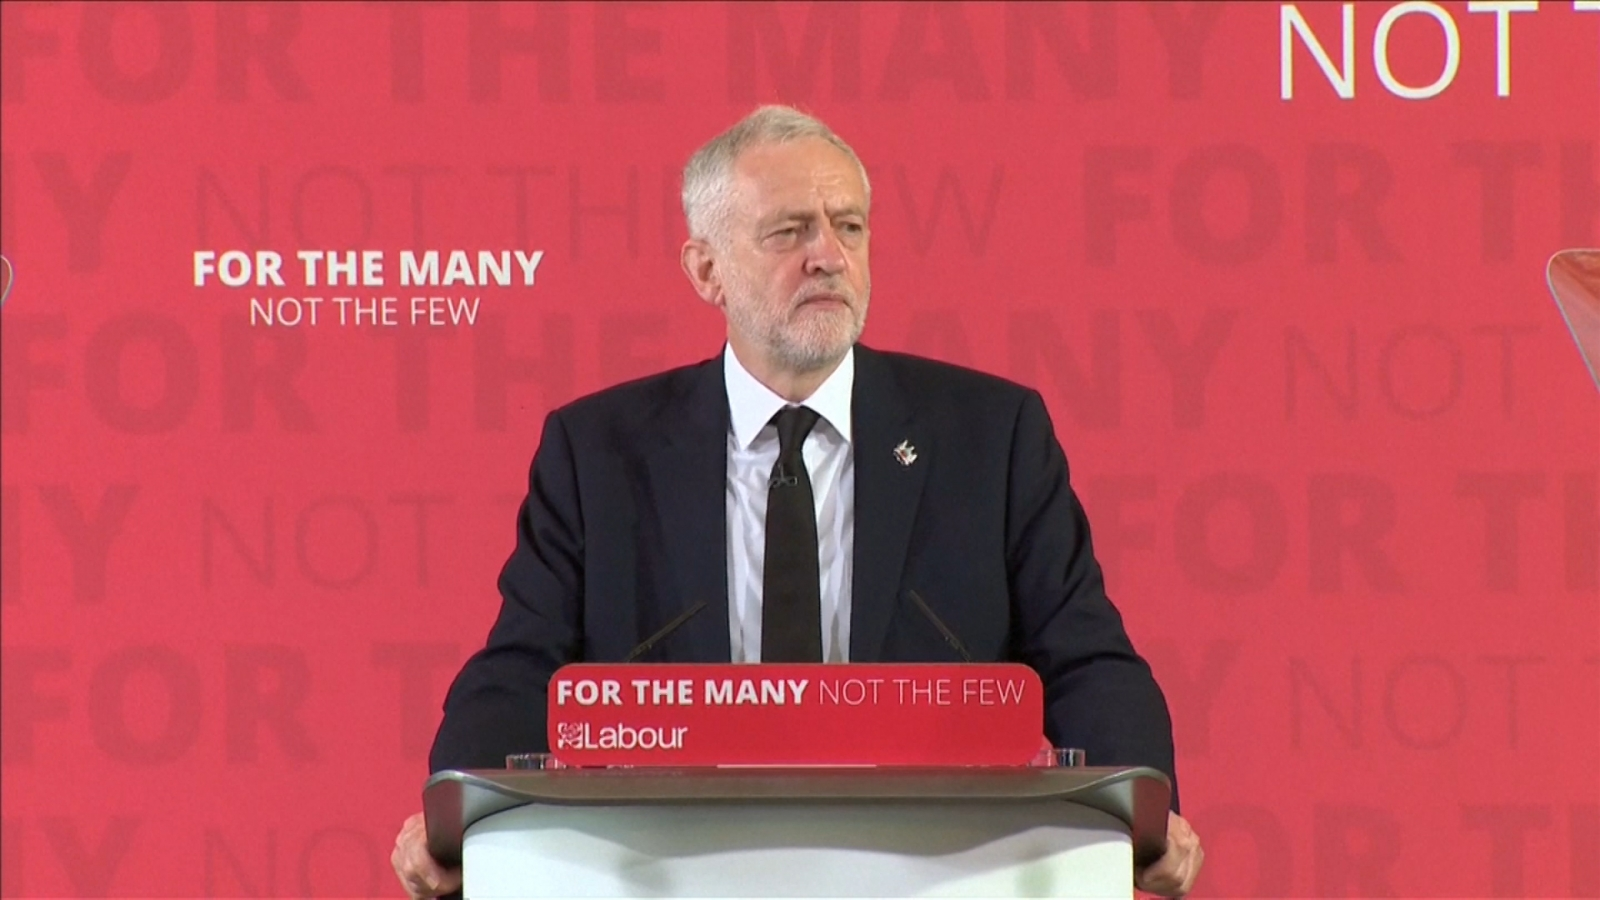 Bernie Sanders 'impressed' by United Kingdom  candidate Jeremy Corbyn